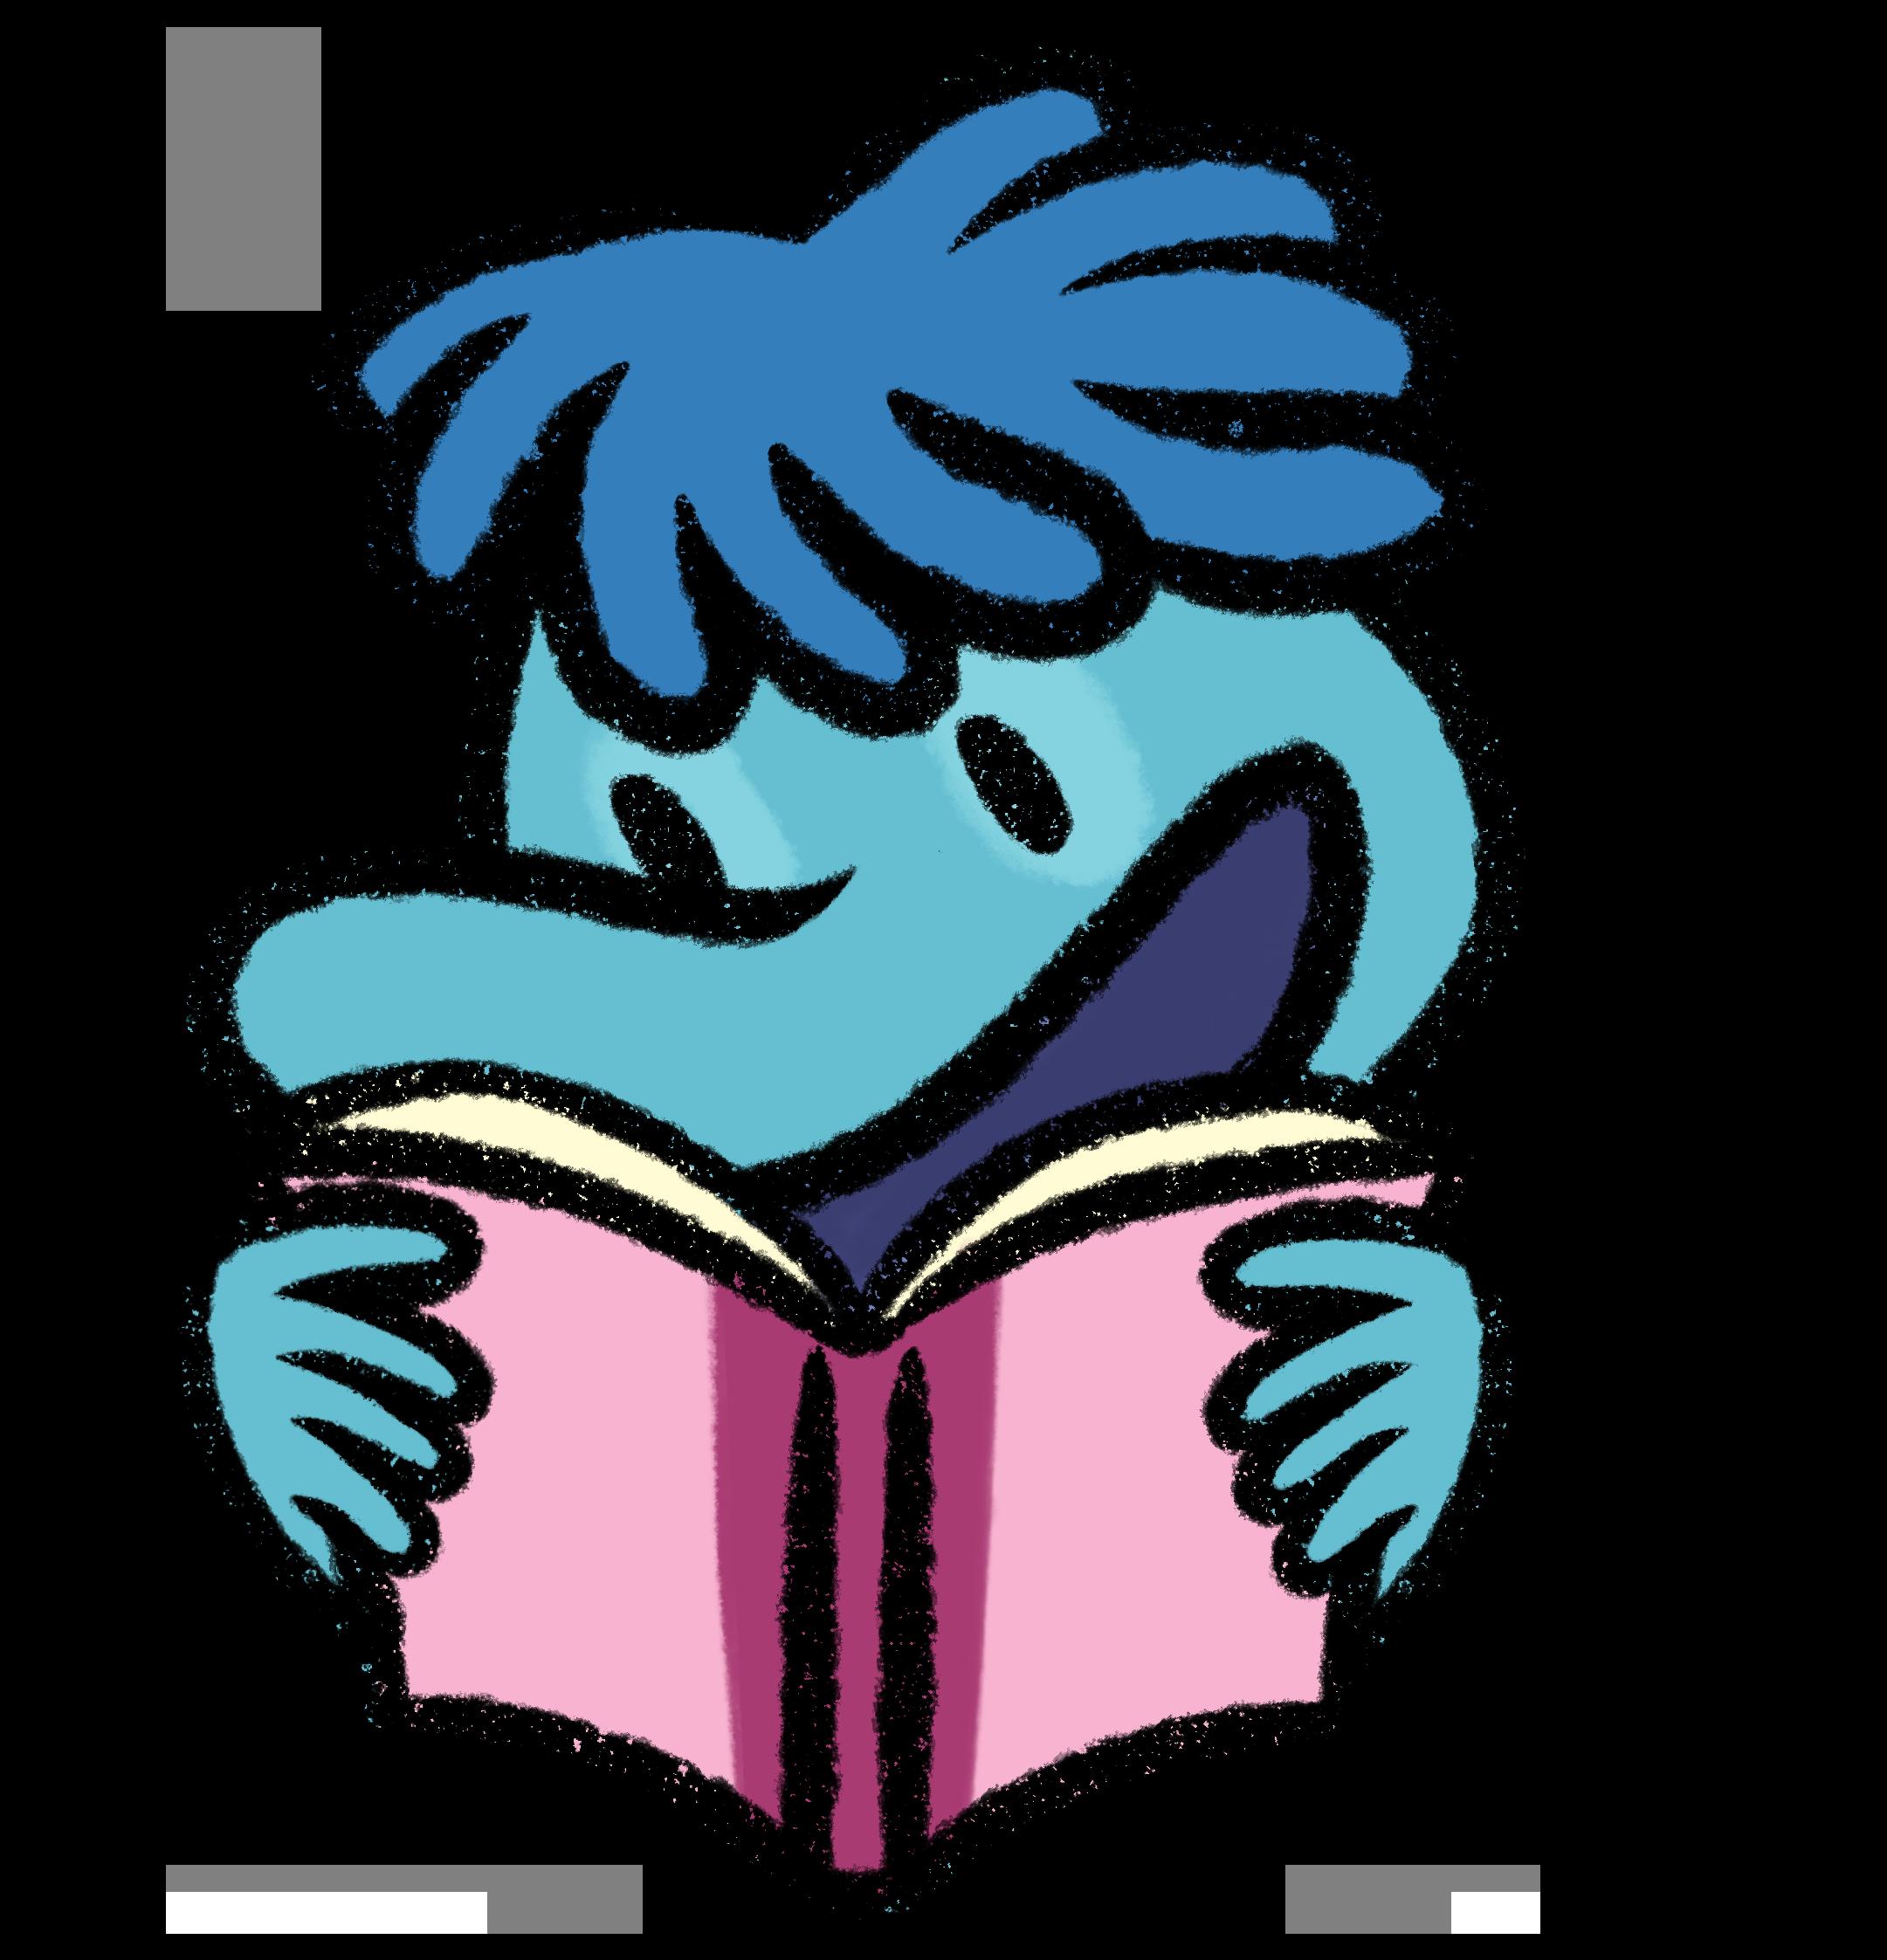 personajes-leyendo-1.png